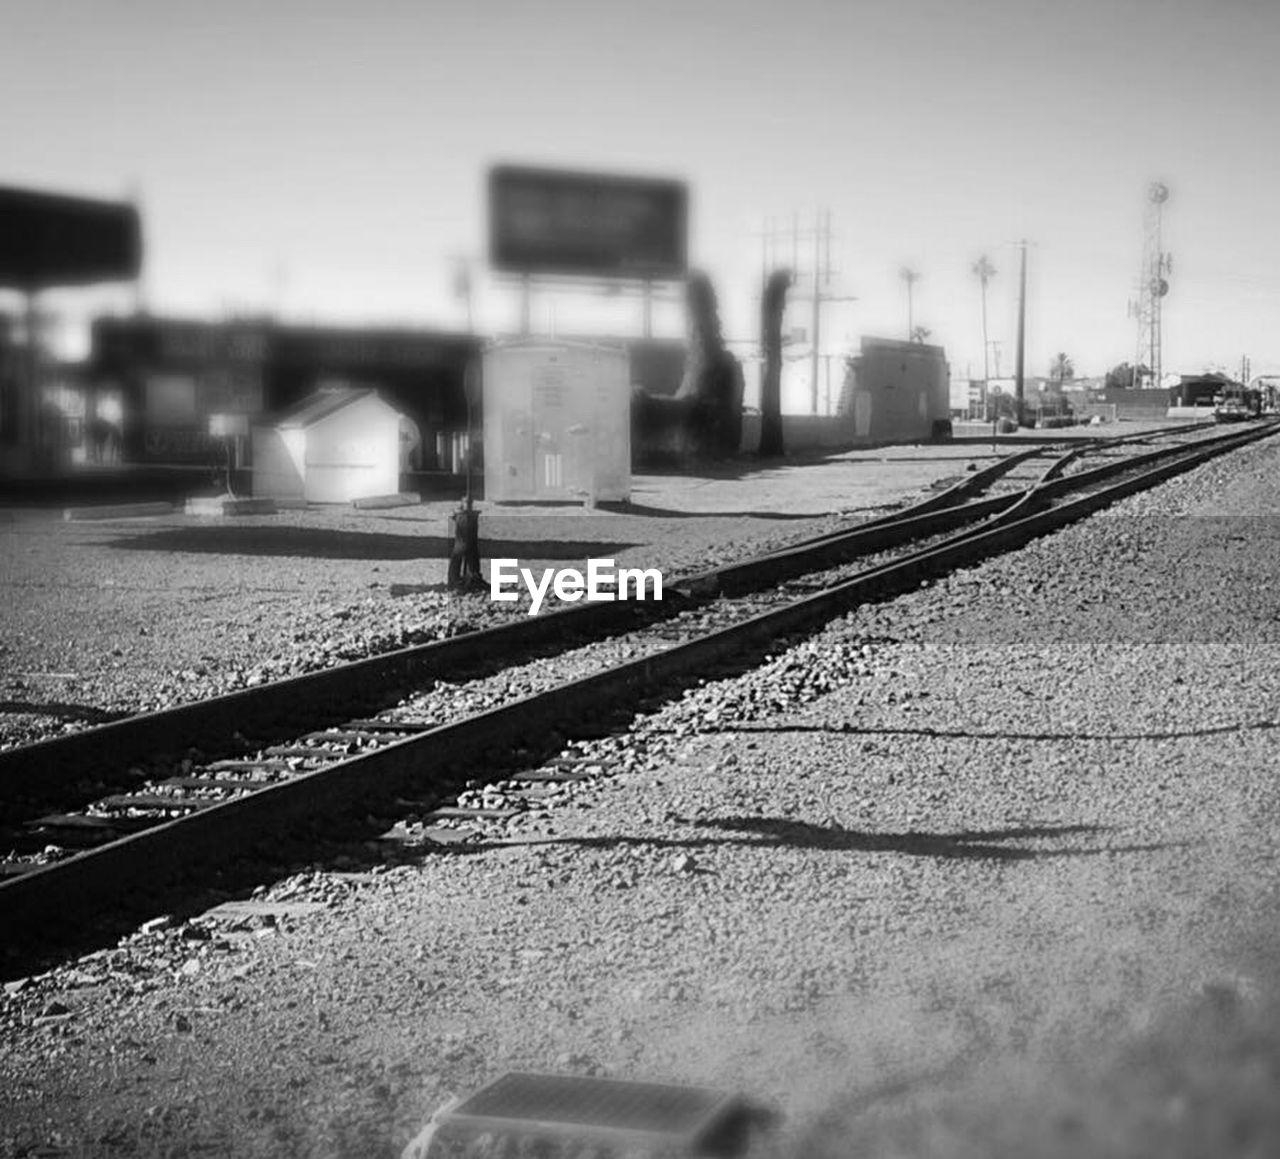 railroad track, transportation, rail transportation, public transportation, architecture, built structure, mode of transport, no people, outdoors, day, building exterior, sky, city, close-up